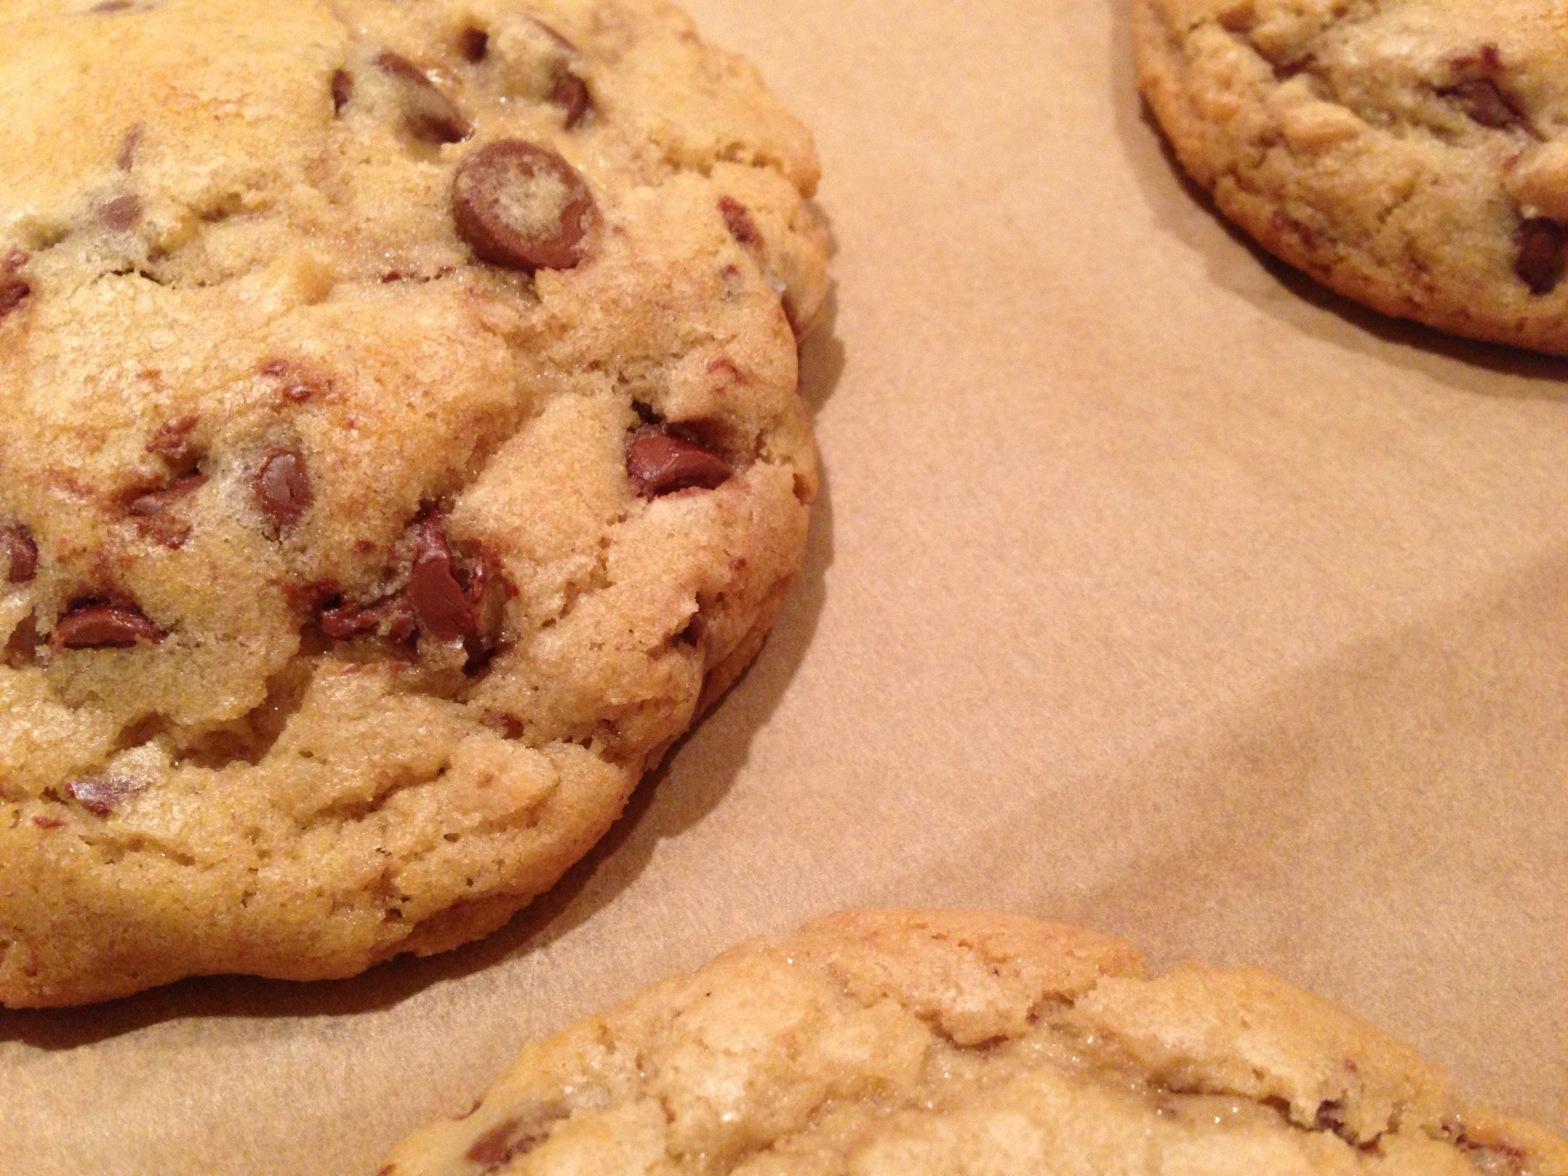 Chocolate Chunk, chocolate chip cookies, perfect chocolate chip recipe